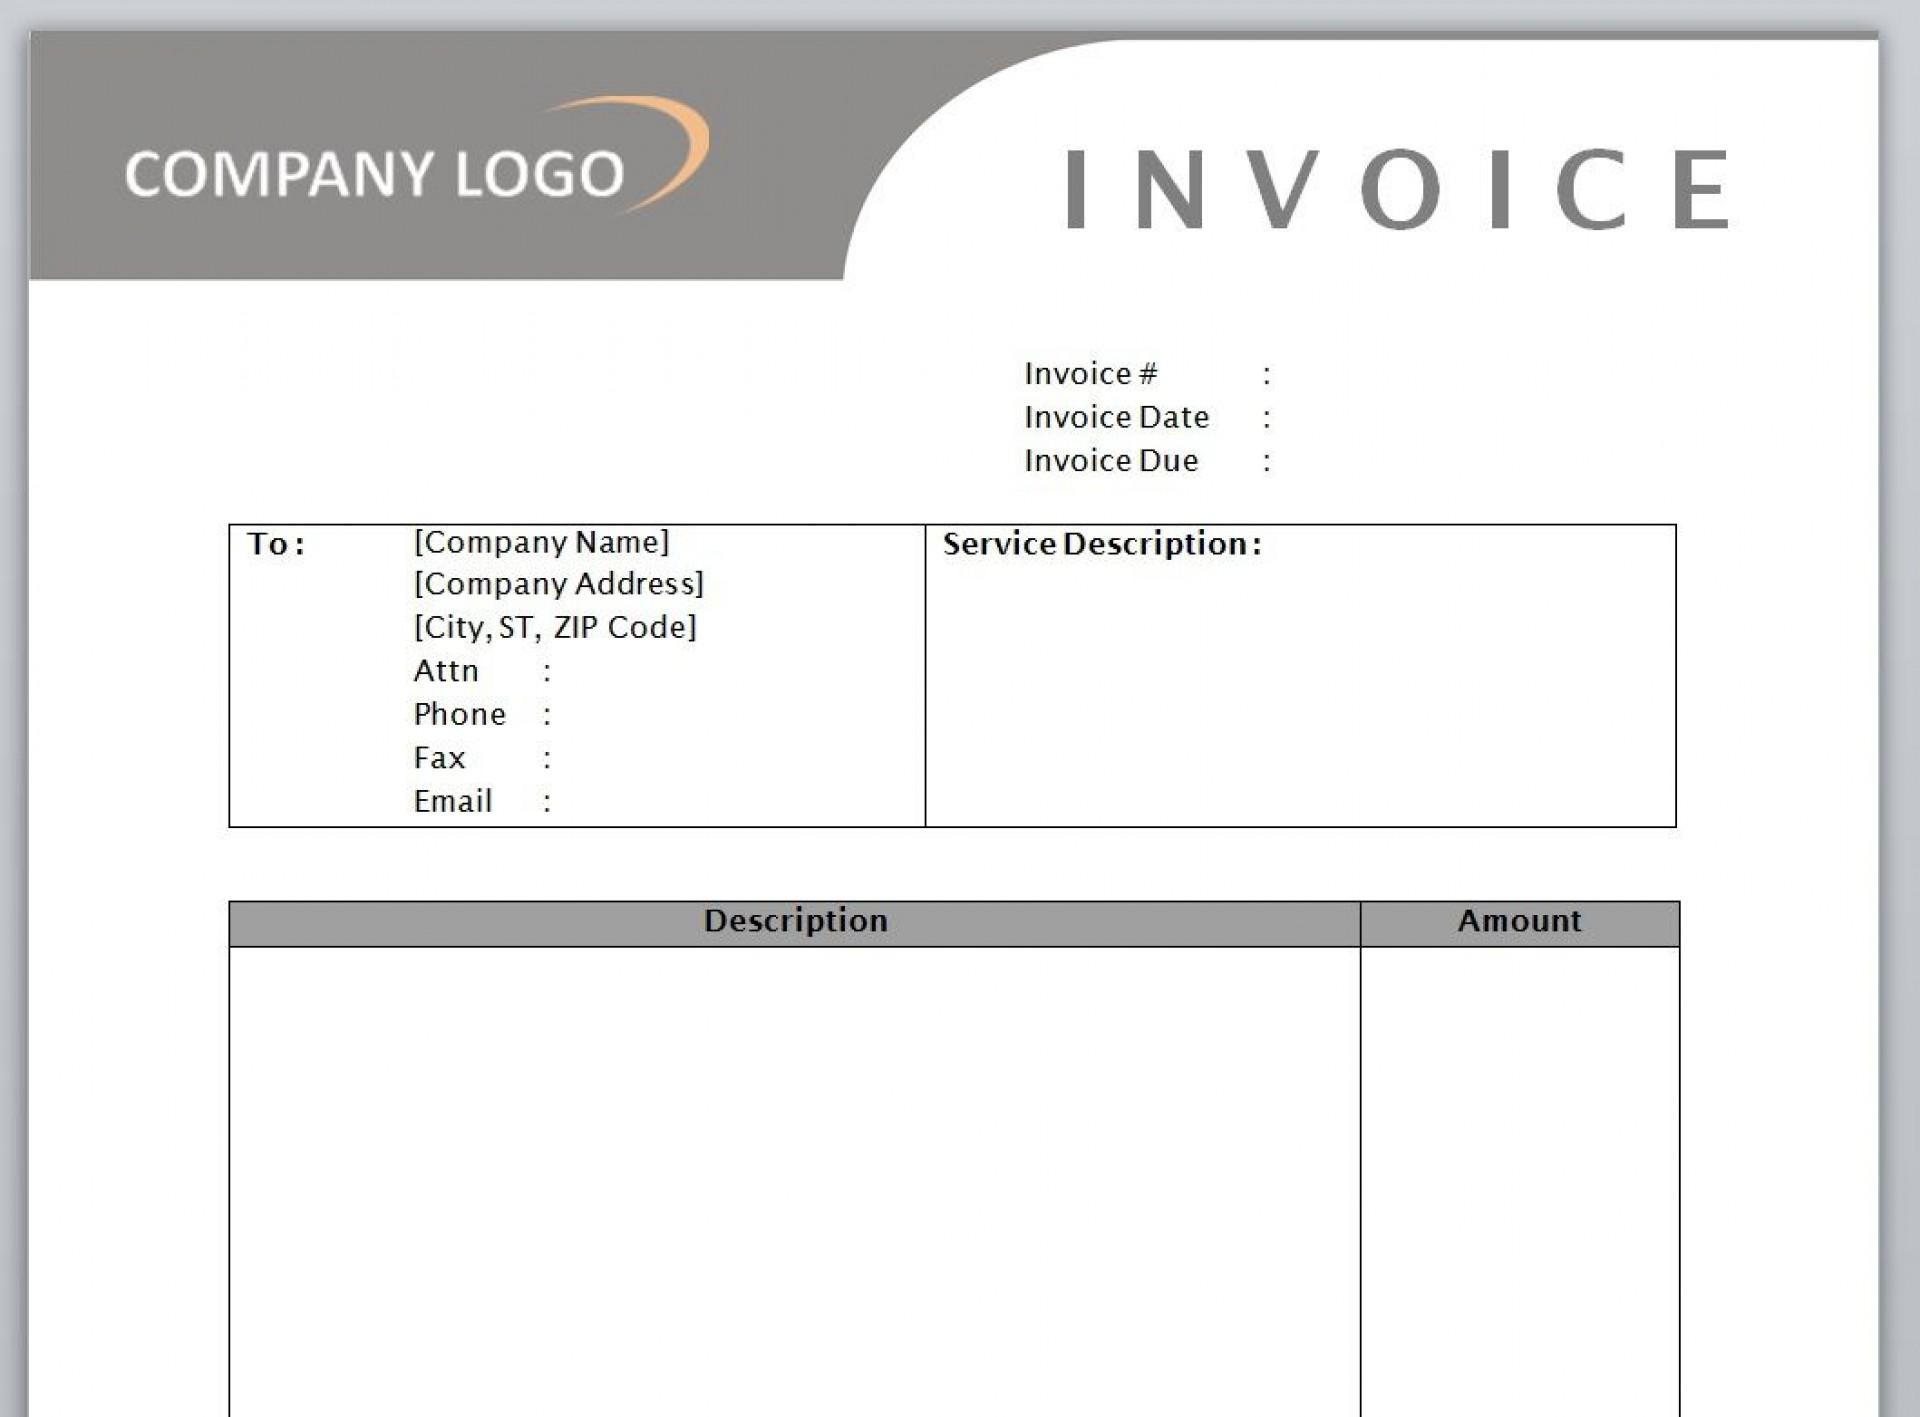 009 Awesome Microsoft Word Auto Repair Invoice Template Idea 1920